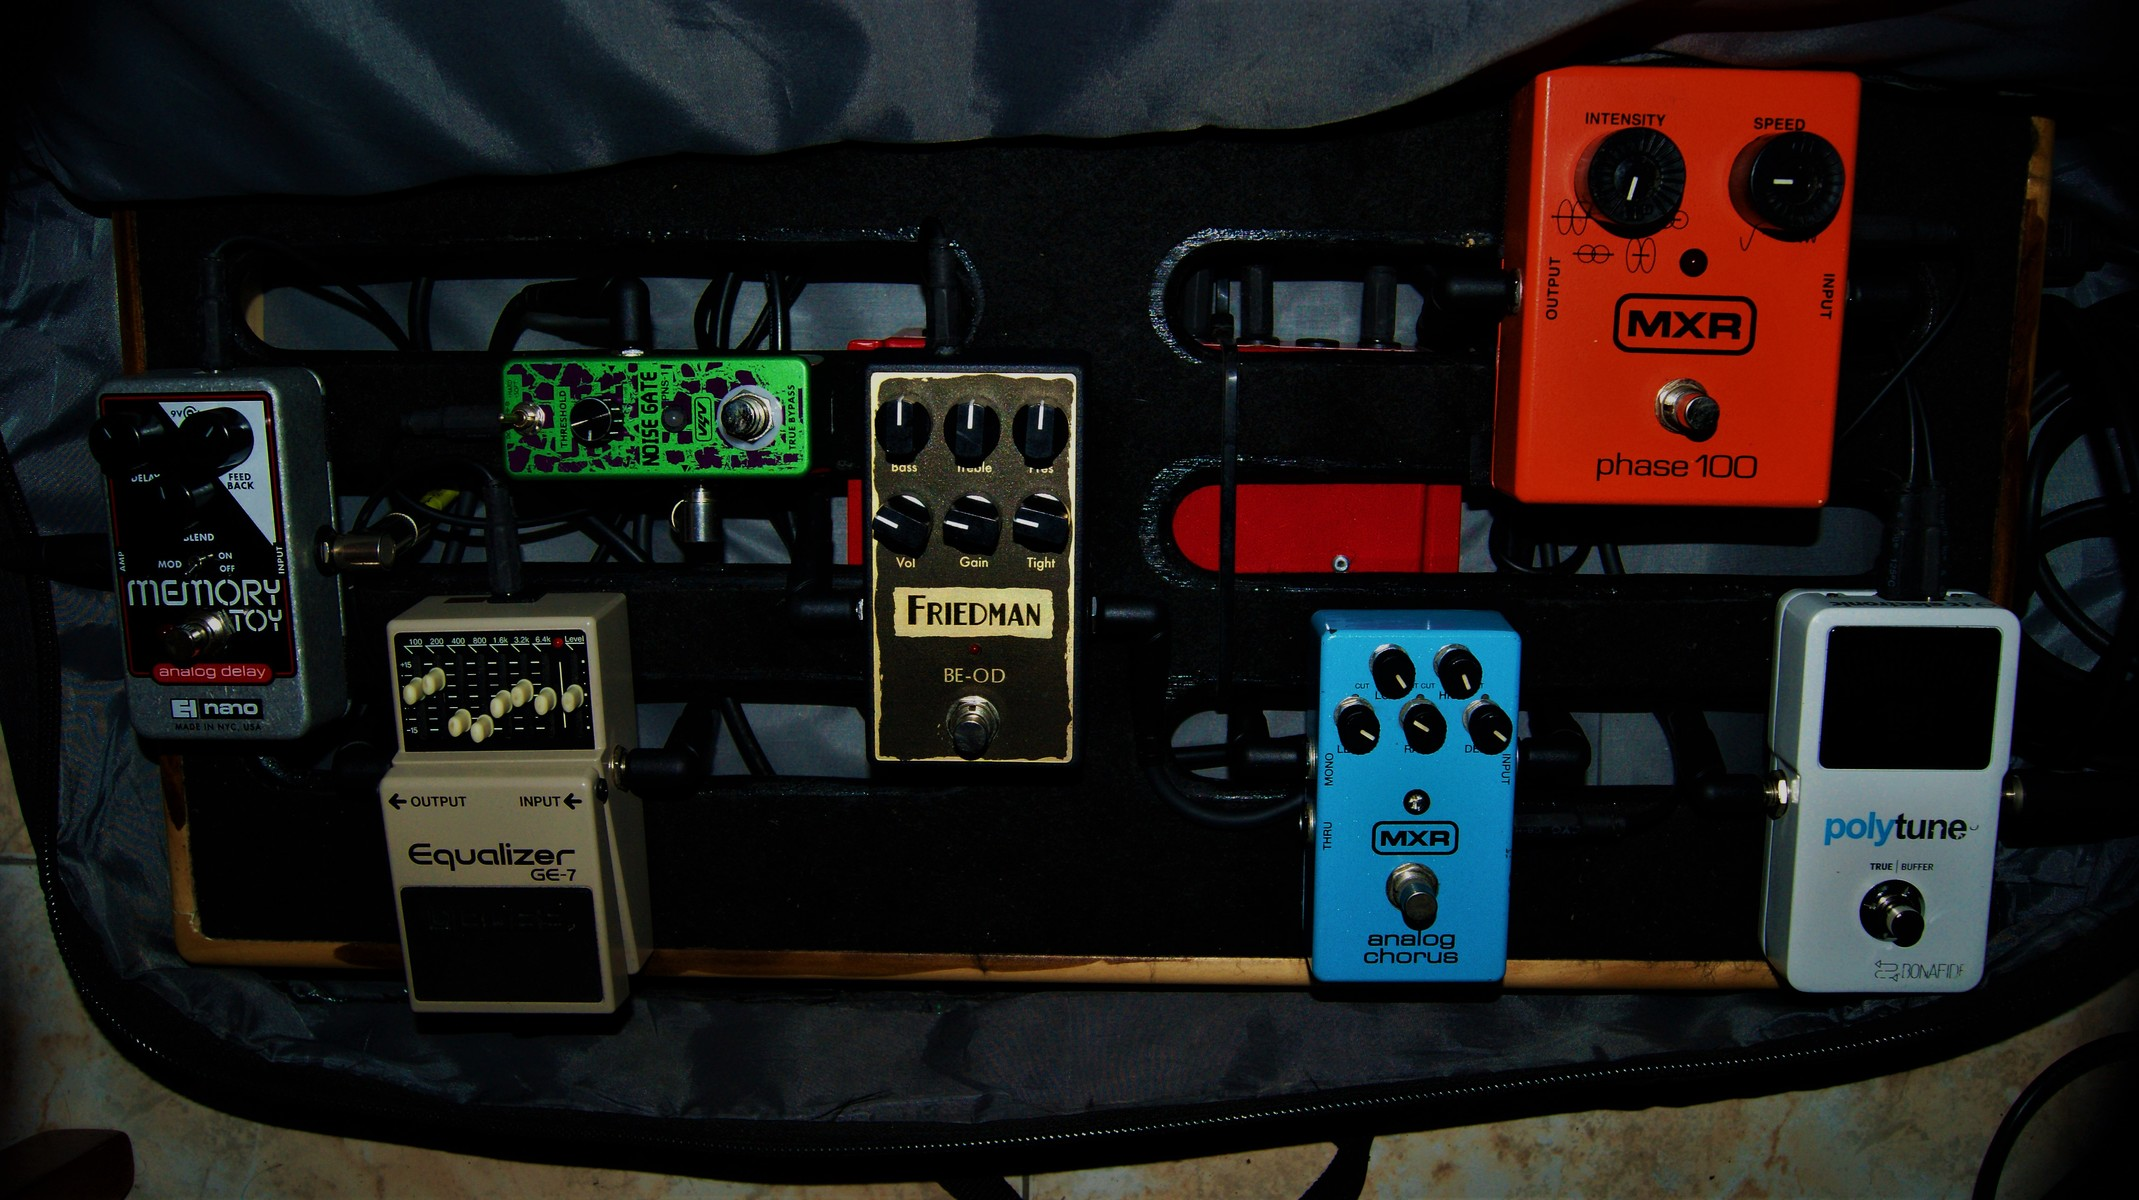 oscar_g_martinez_p's music gear photo containing Boss GE-7 Equalizer, Electro-Harmonix Memory Toy, MXR M107 Phase 100, MXR M234 Analog Chorus, Friedman BE-OD Overdrive Pedal, TC Electronic PolyTune 3, and Rowin Guitar Noise Killer Noise Gate Suppressor Effect Pedal